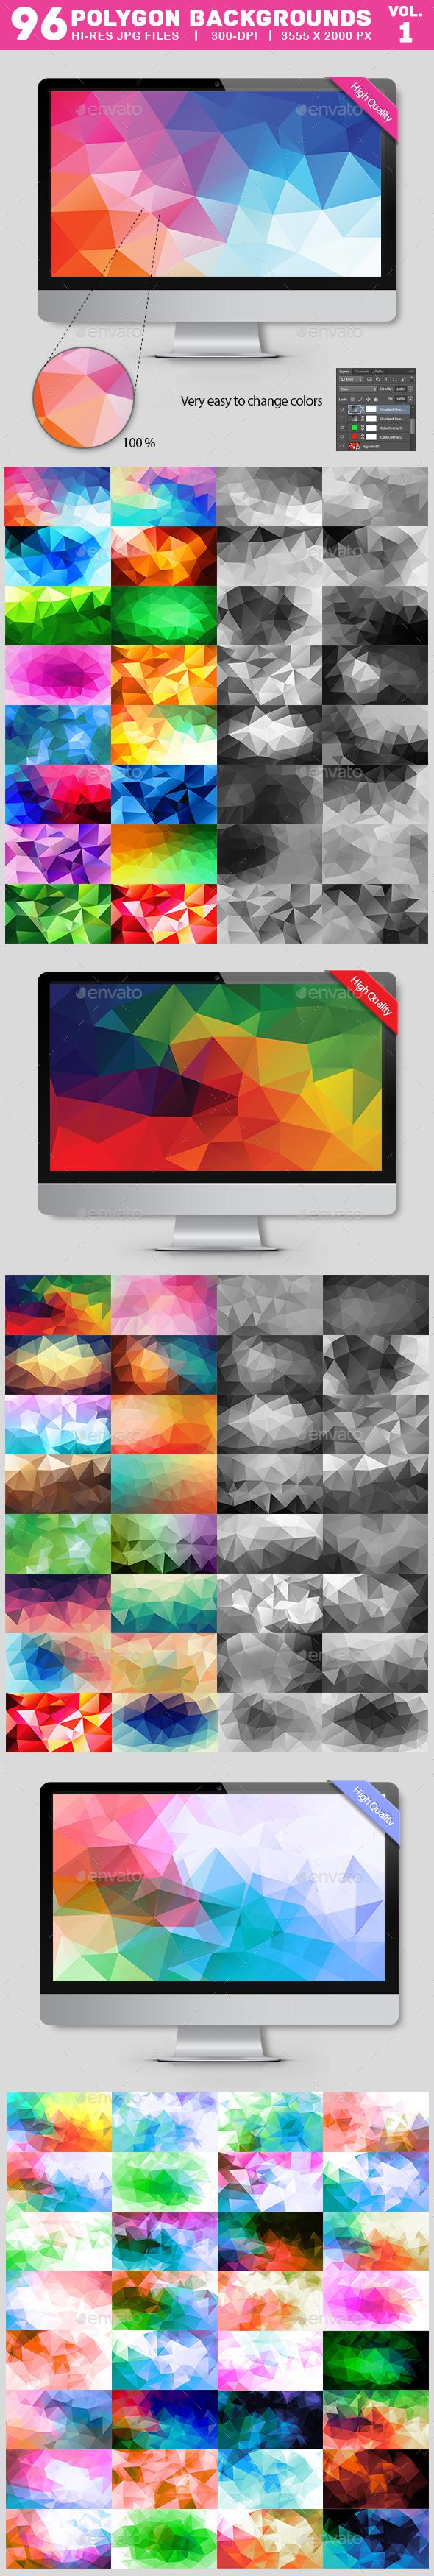 96 Polygon Backgrounds Bundle